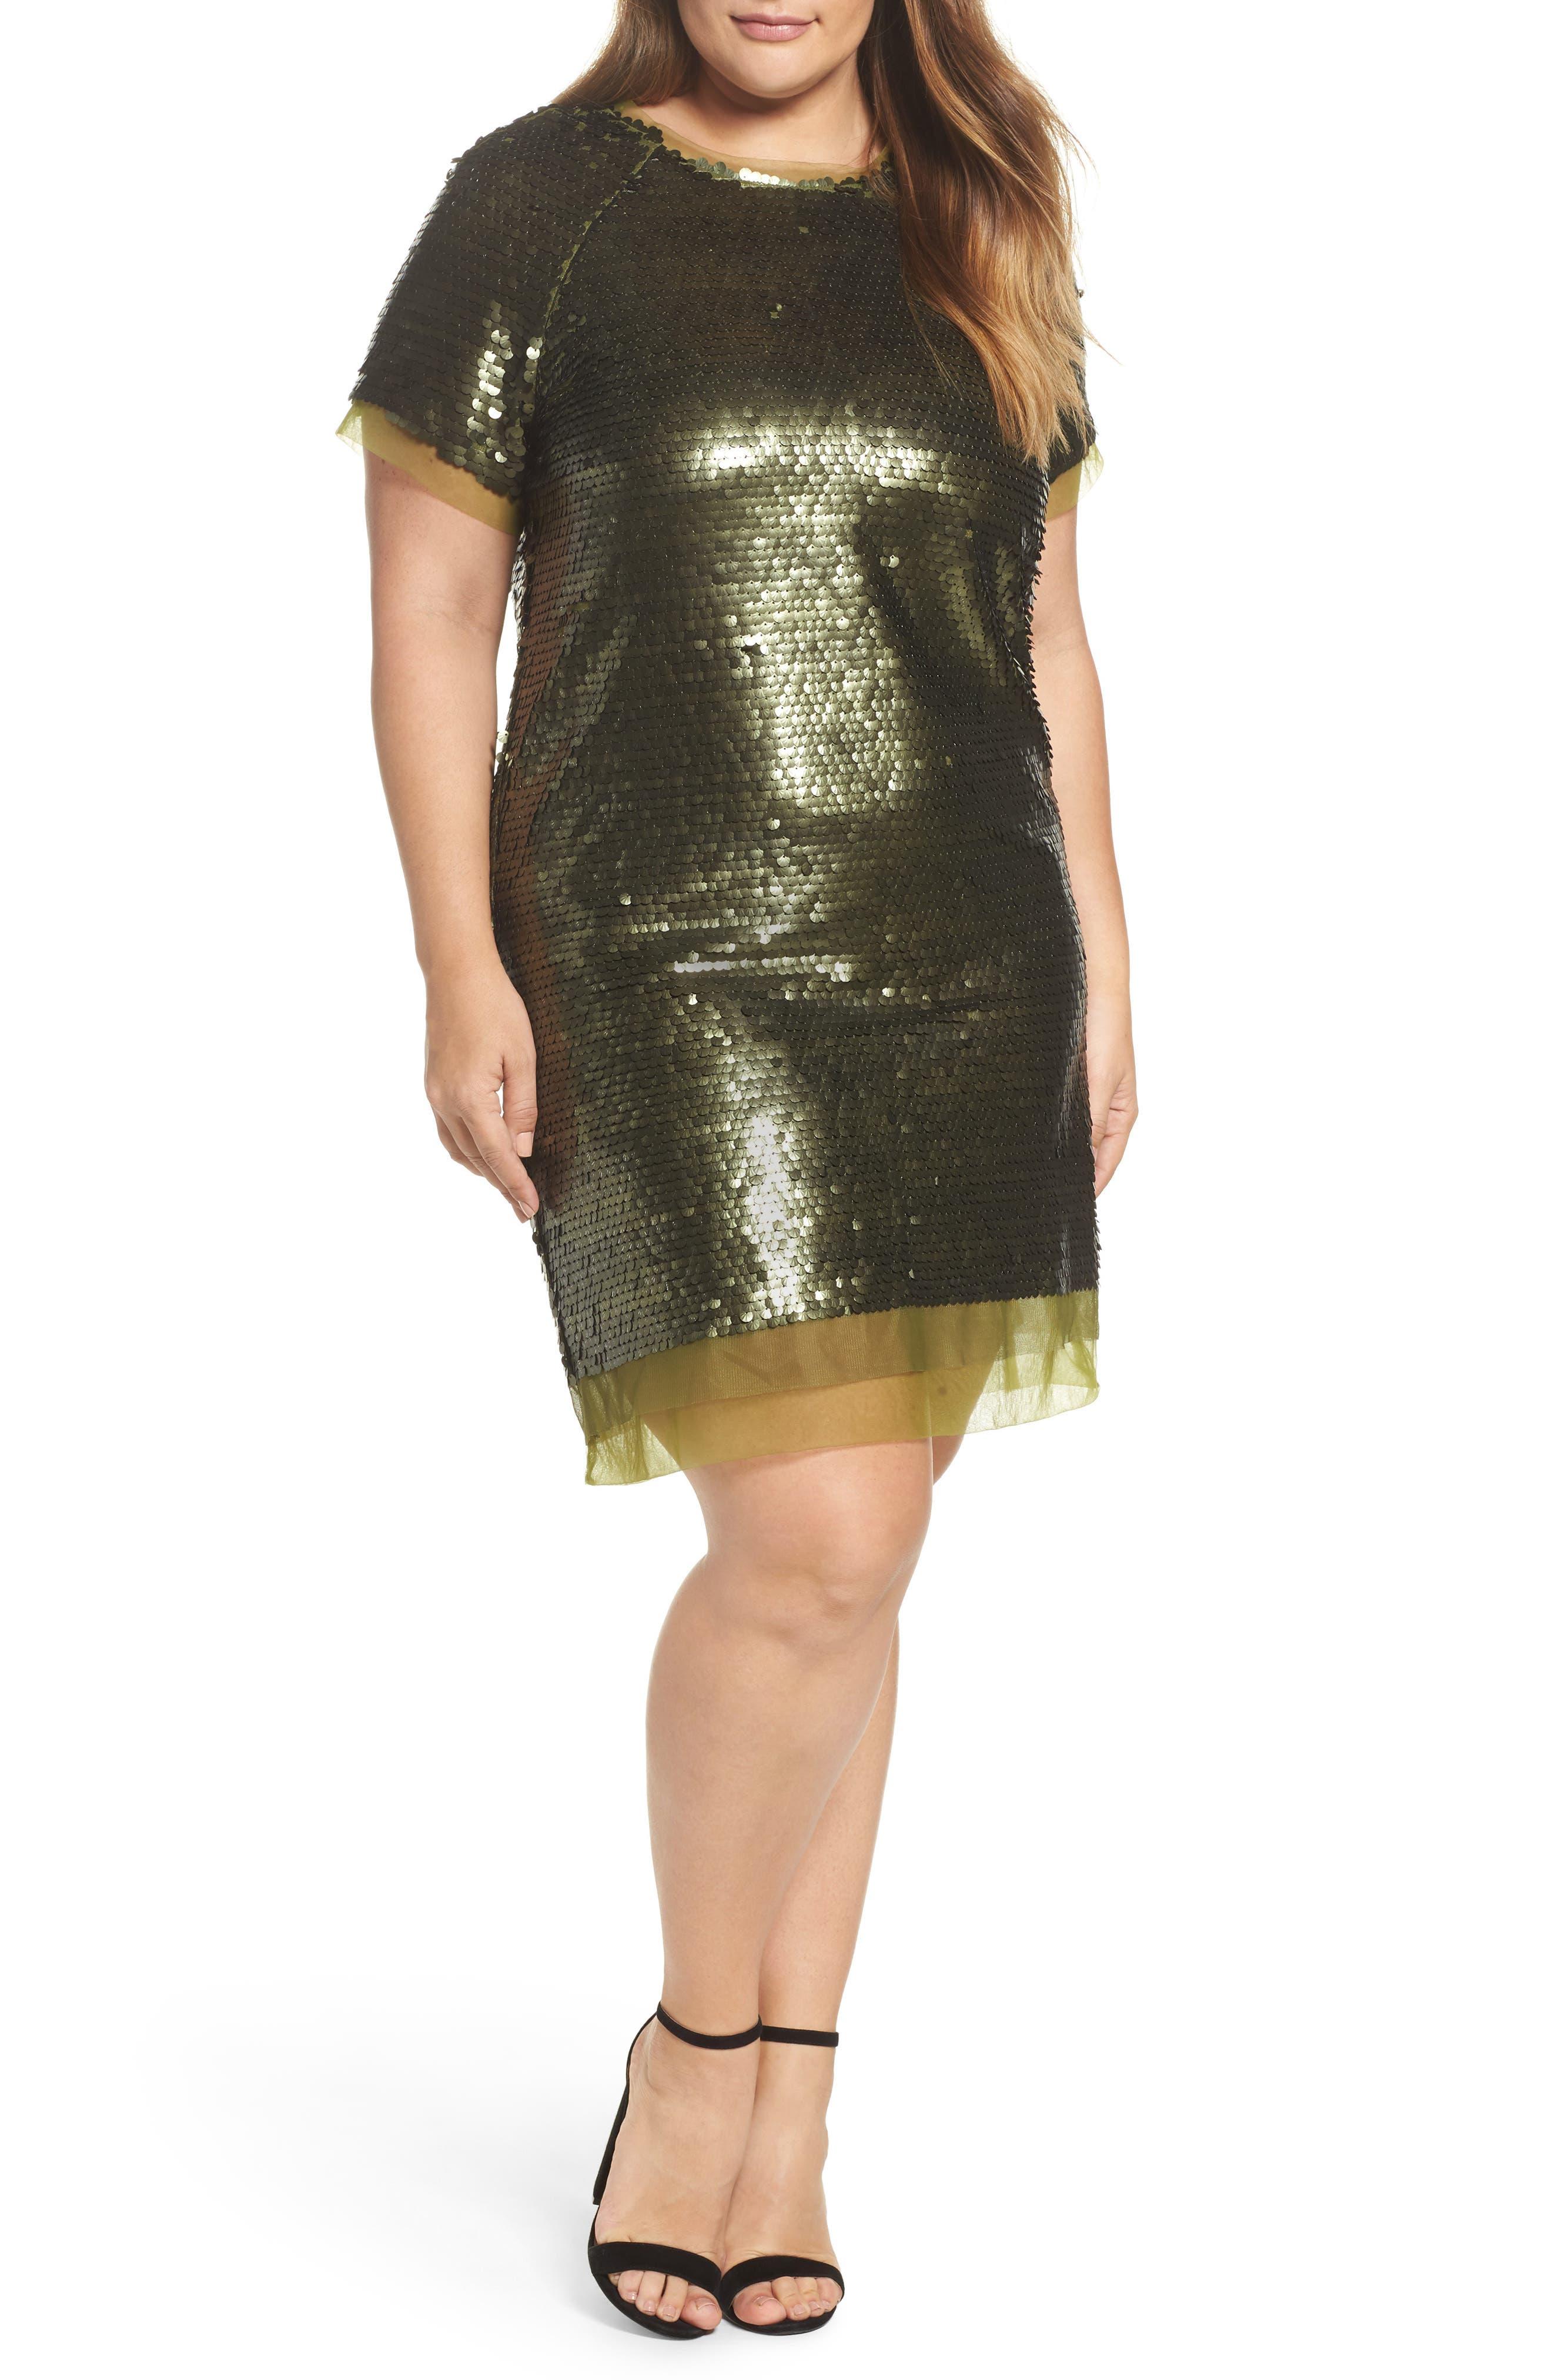 Alternate Image 1 Selected - ELVI Sequin Mini Dress (Plus Size)